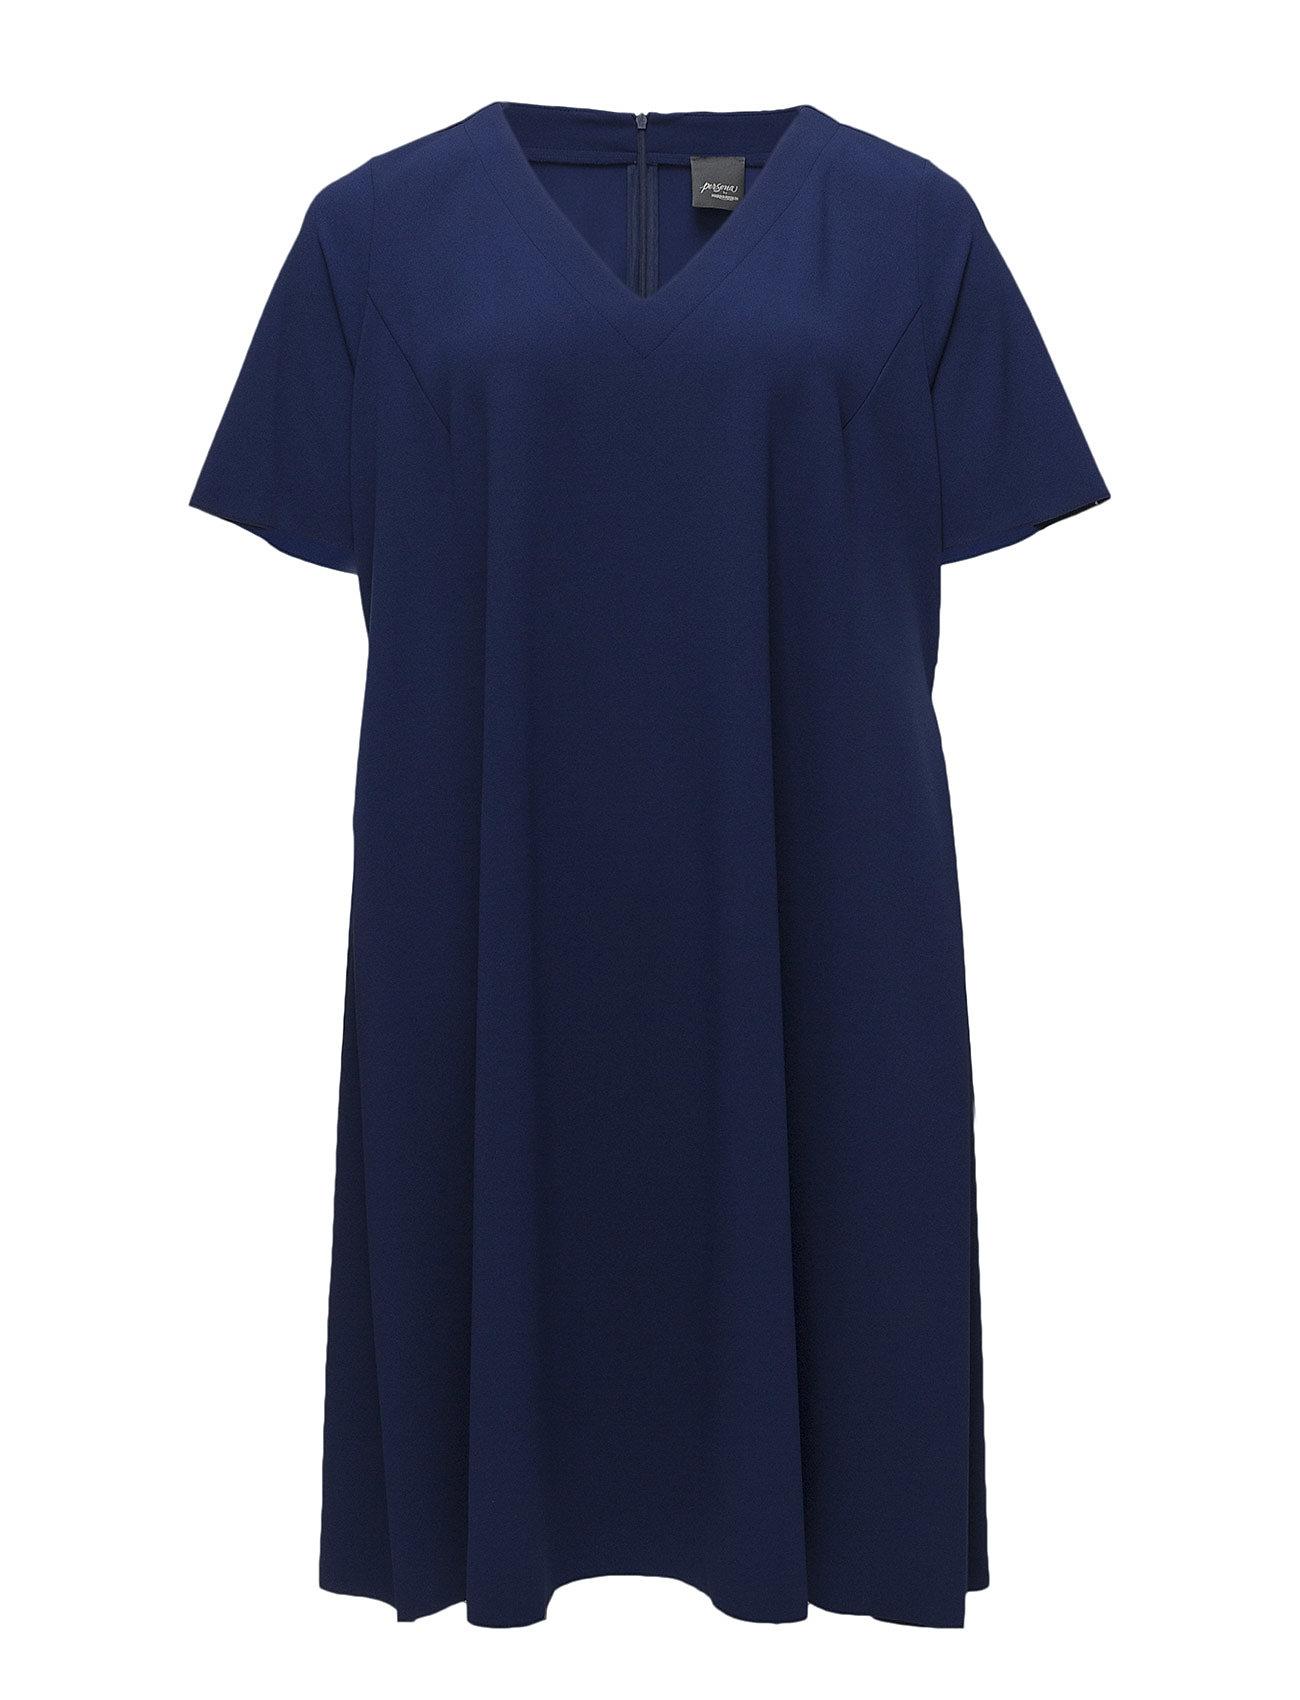 1e5f1cdee91 Opale (Navy Blue) (87.50 €) - Persona by Marina Rinaldi - | Boozt.com